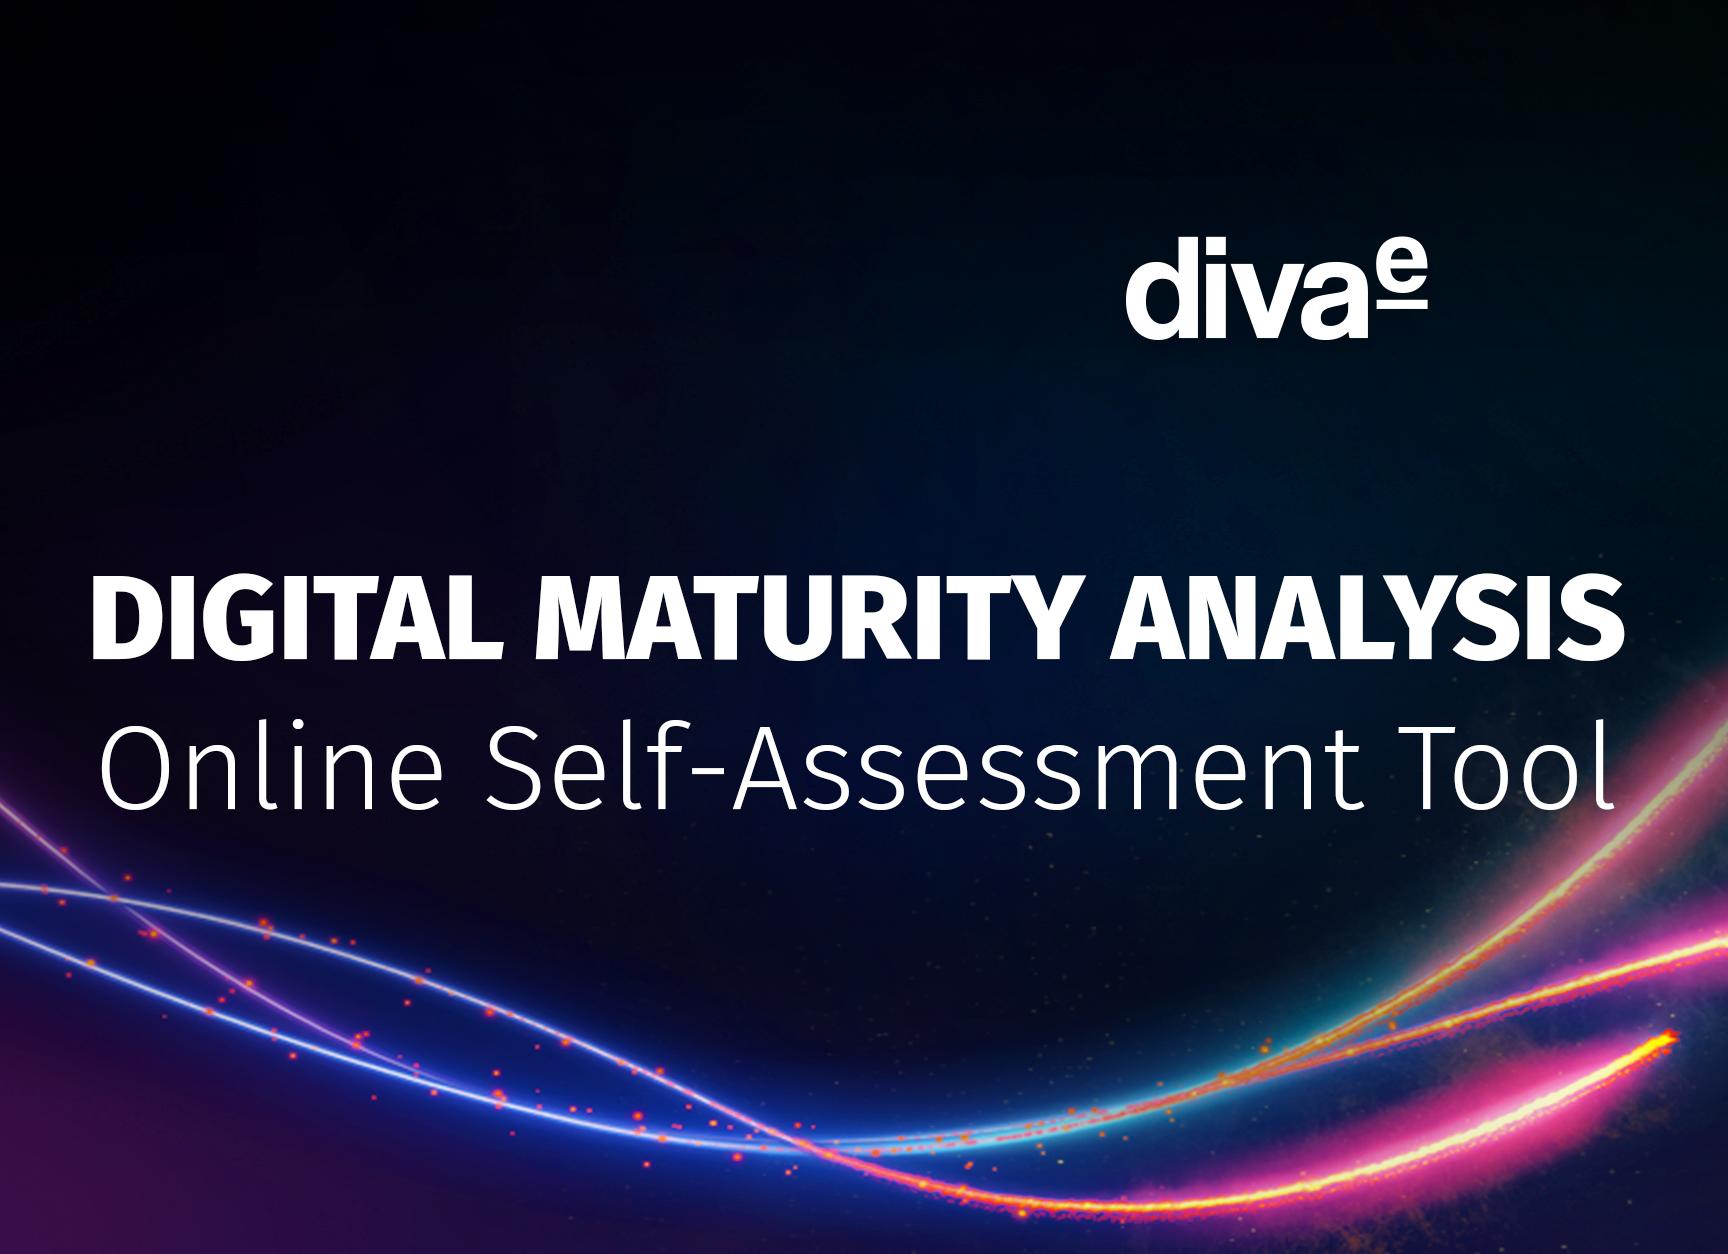 Kostenloses diva-e Online-Tool liefert Einblick in Ihre digitale Reife